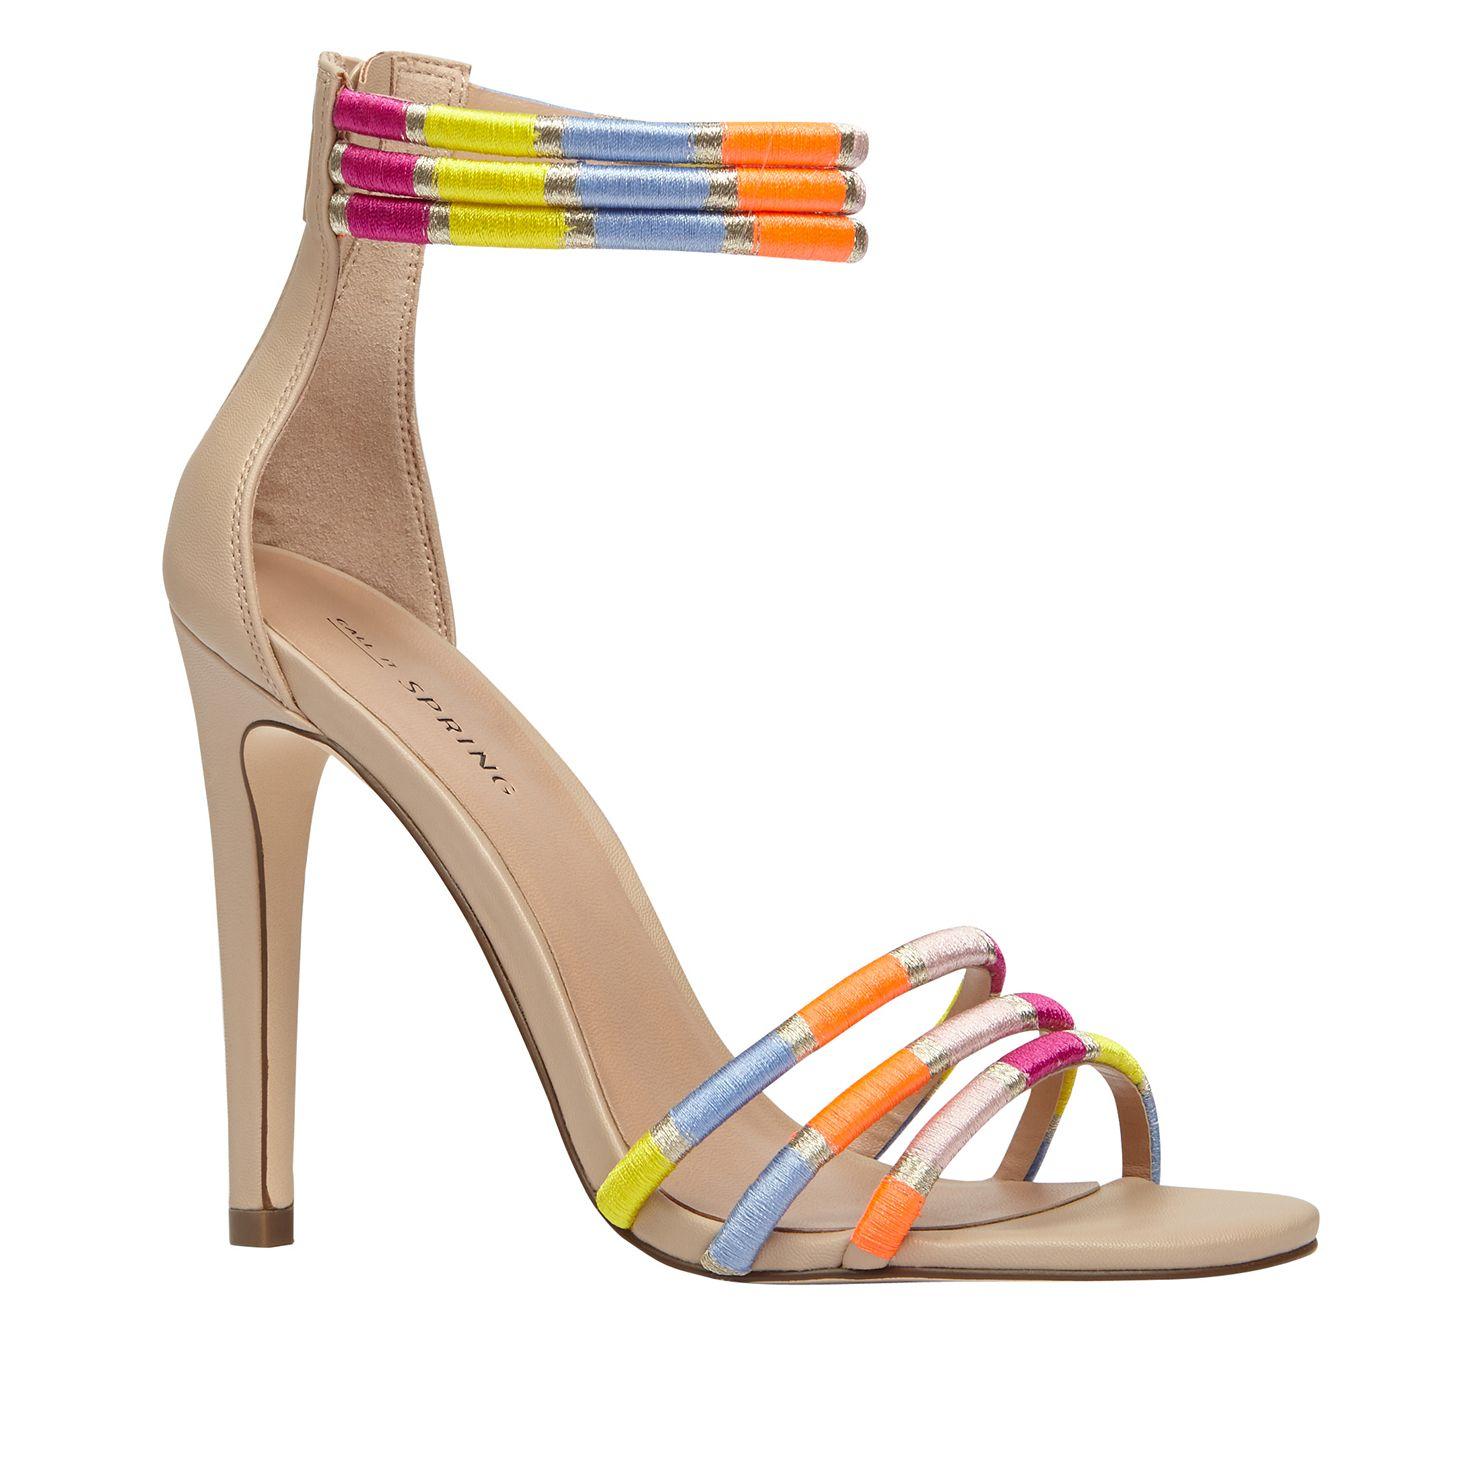 ADAENIA Women's Sandals on Sale Call It Spring Canada